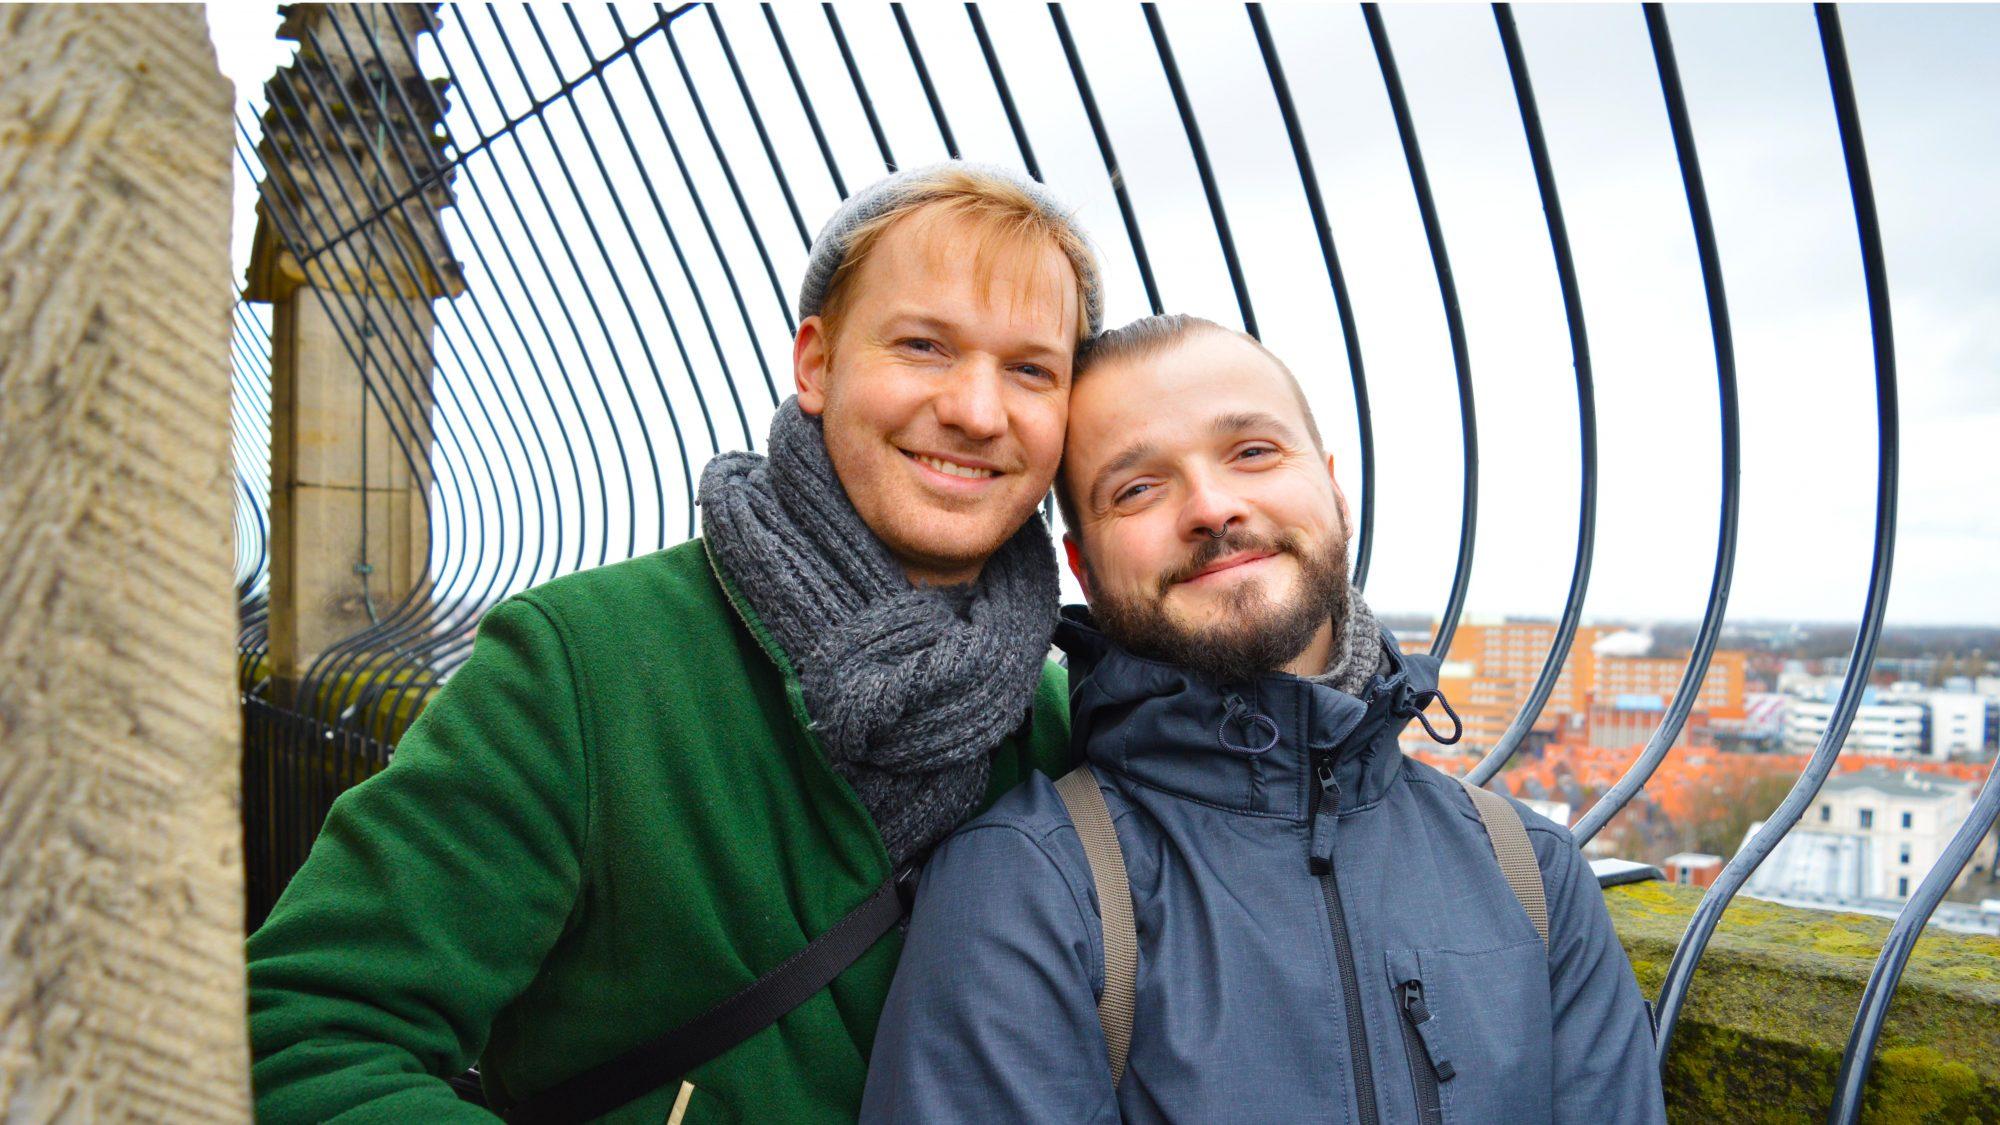 Gay contact groningen [PUNIQRANDLINE-(au-dating-names.txt) 27